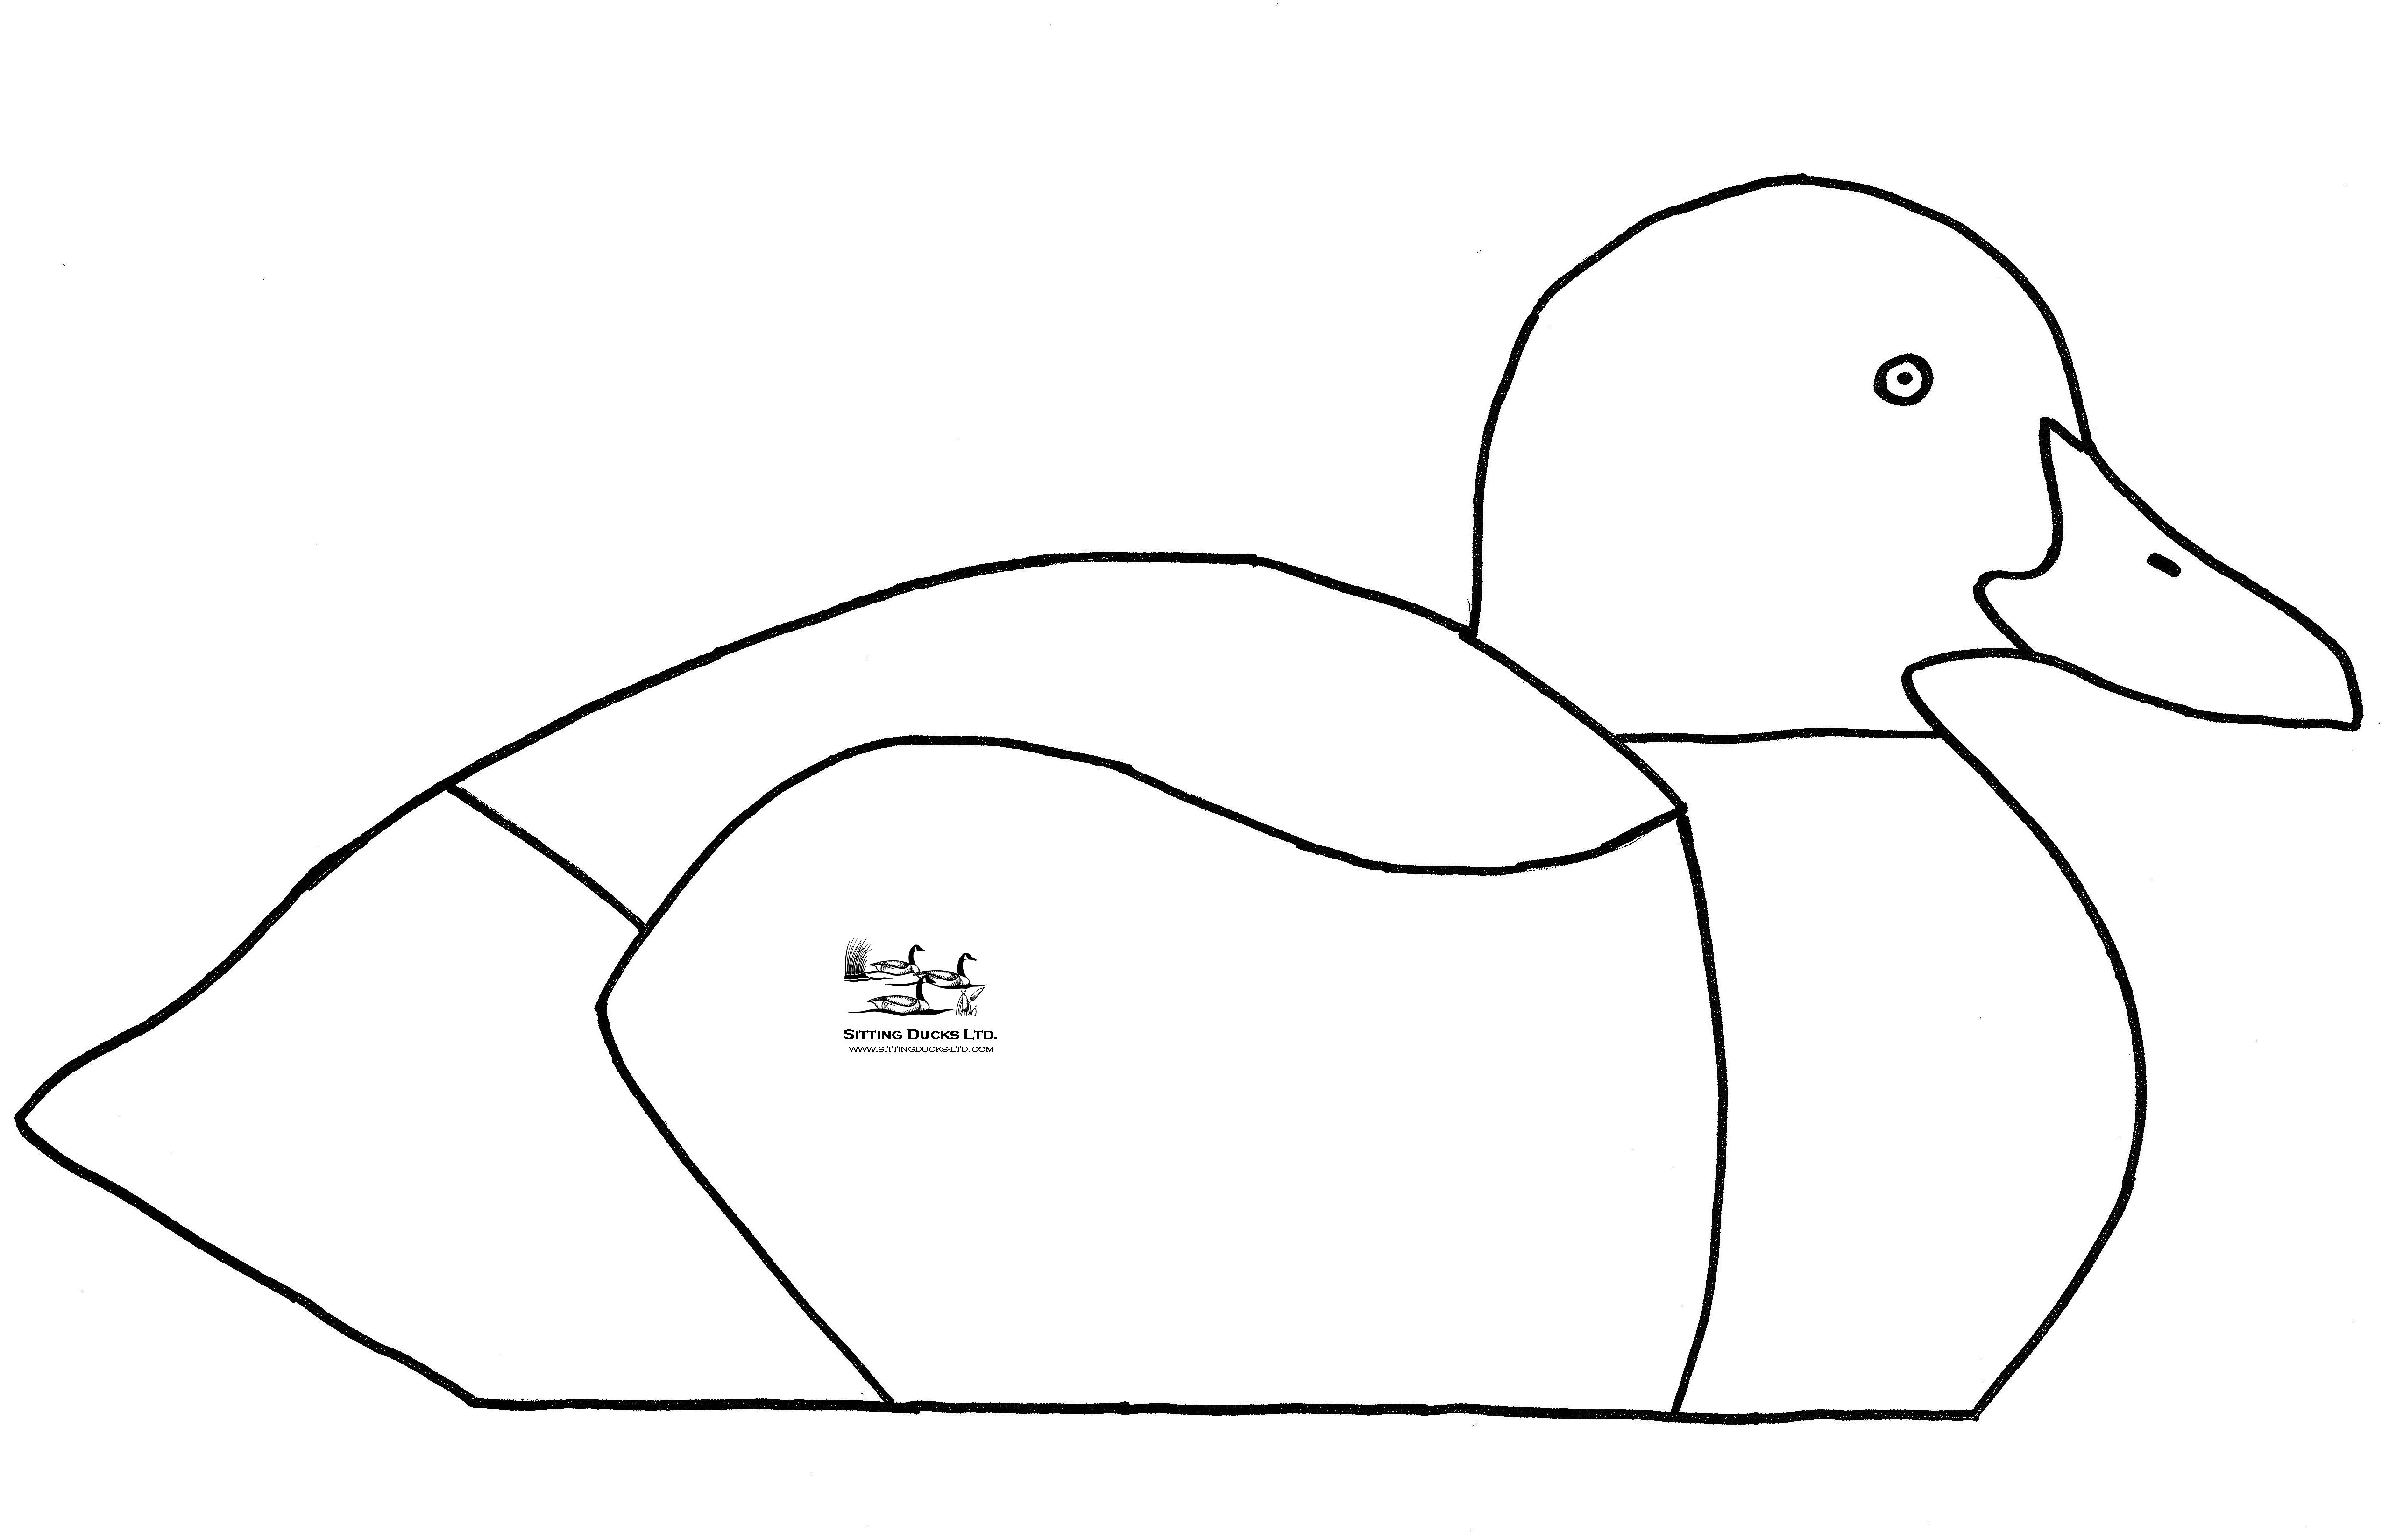 5100x3297 Goose Decoys, V Board Goose Amp Duck Decoys From Sitting Ducks, Ltd